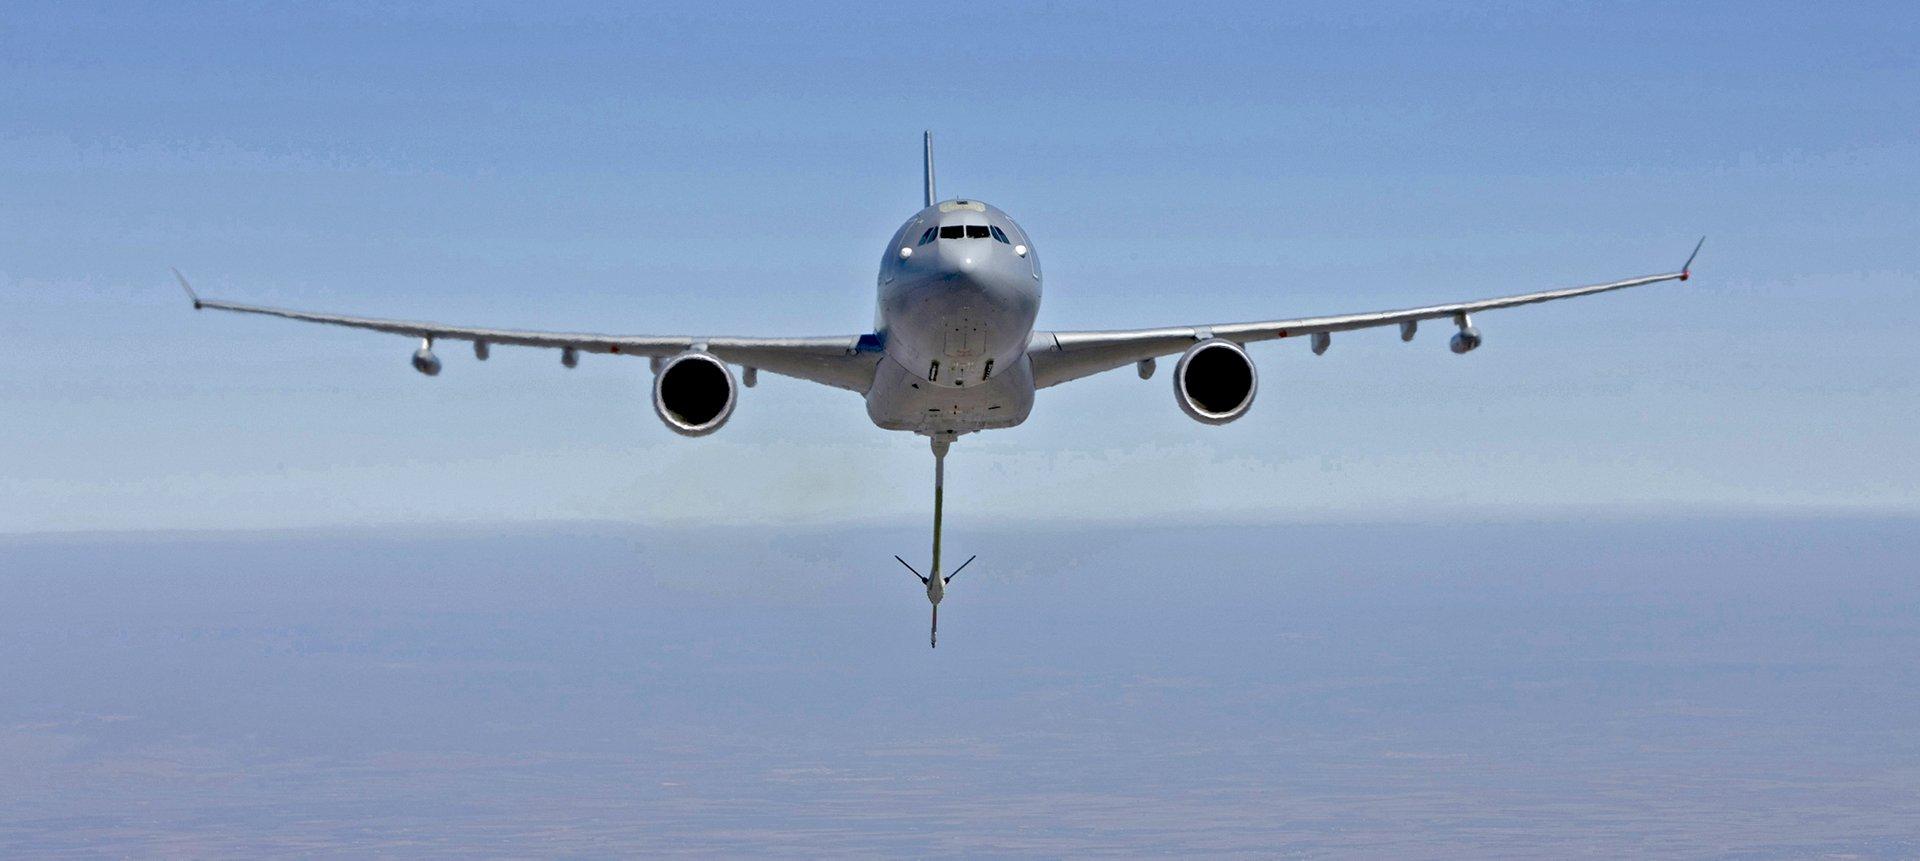 A330 MRTT RAAF aircraft